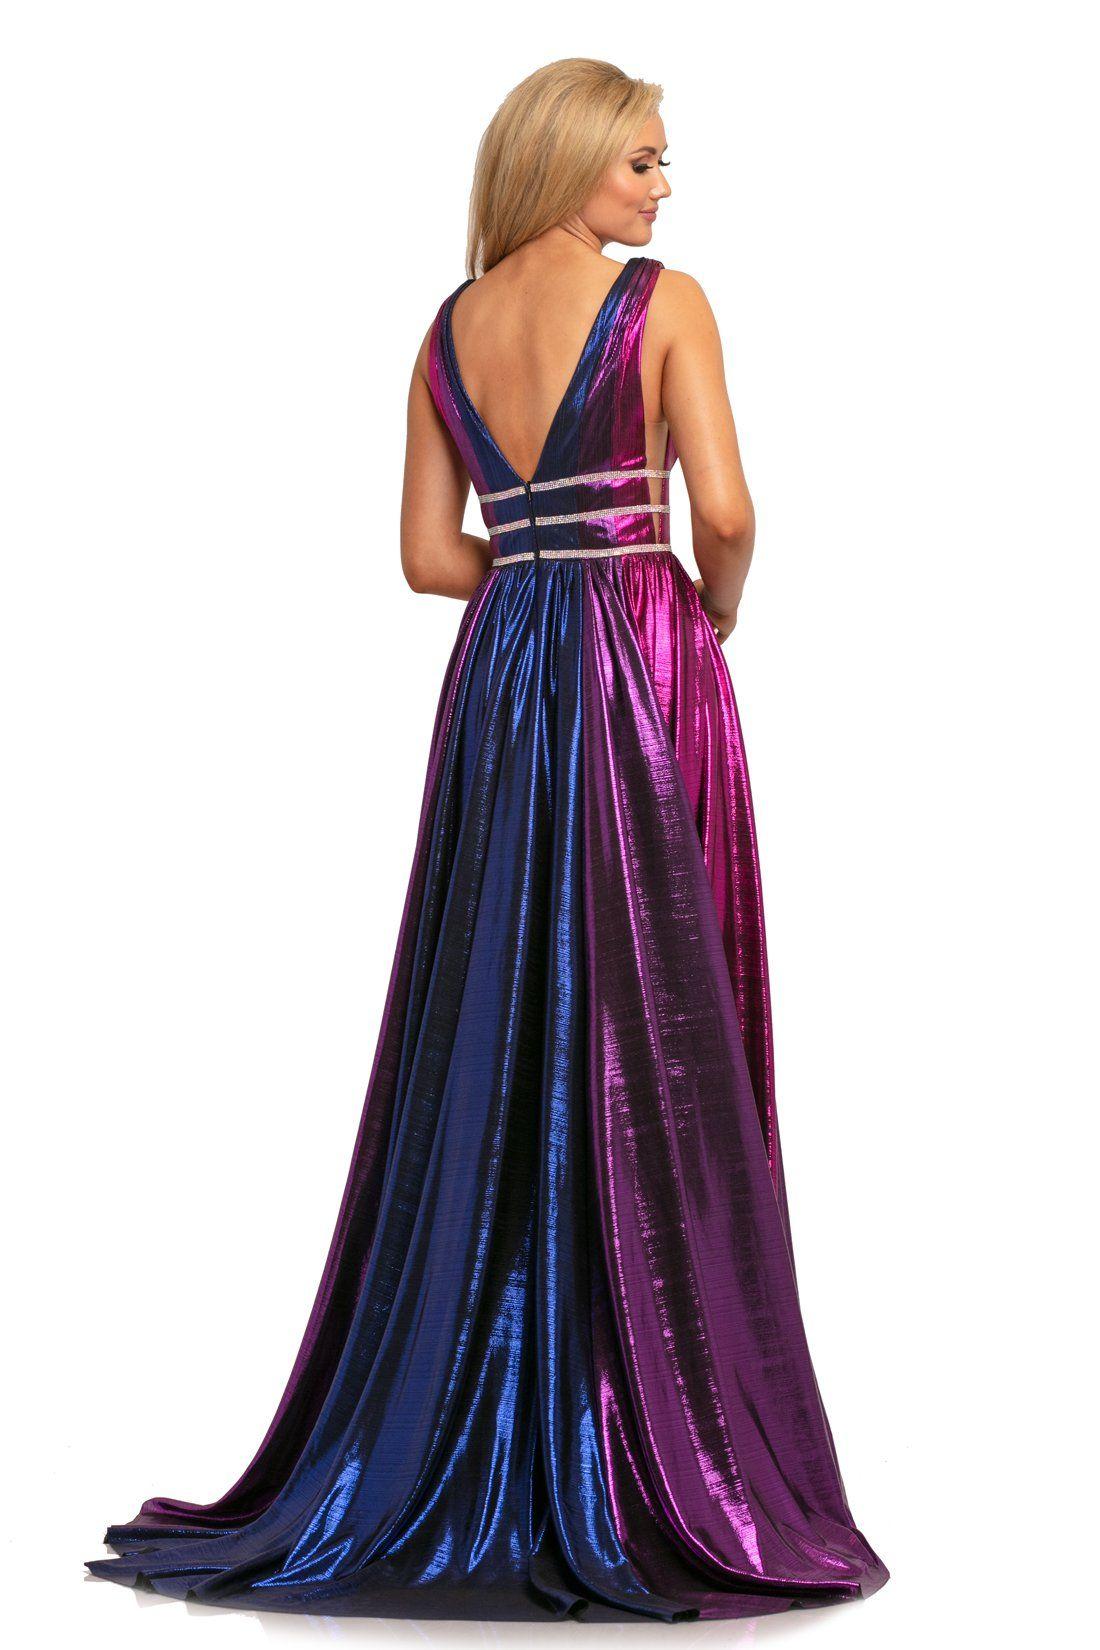 Johnathan Kayne 2008 Plunging Multi Colored Metallic A Line Gown Johnathan Kayne A Line Gown Multi Color Prom Dress [ 1650 x 1100 Pixel ]